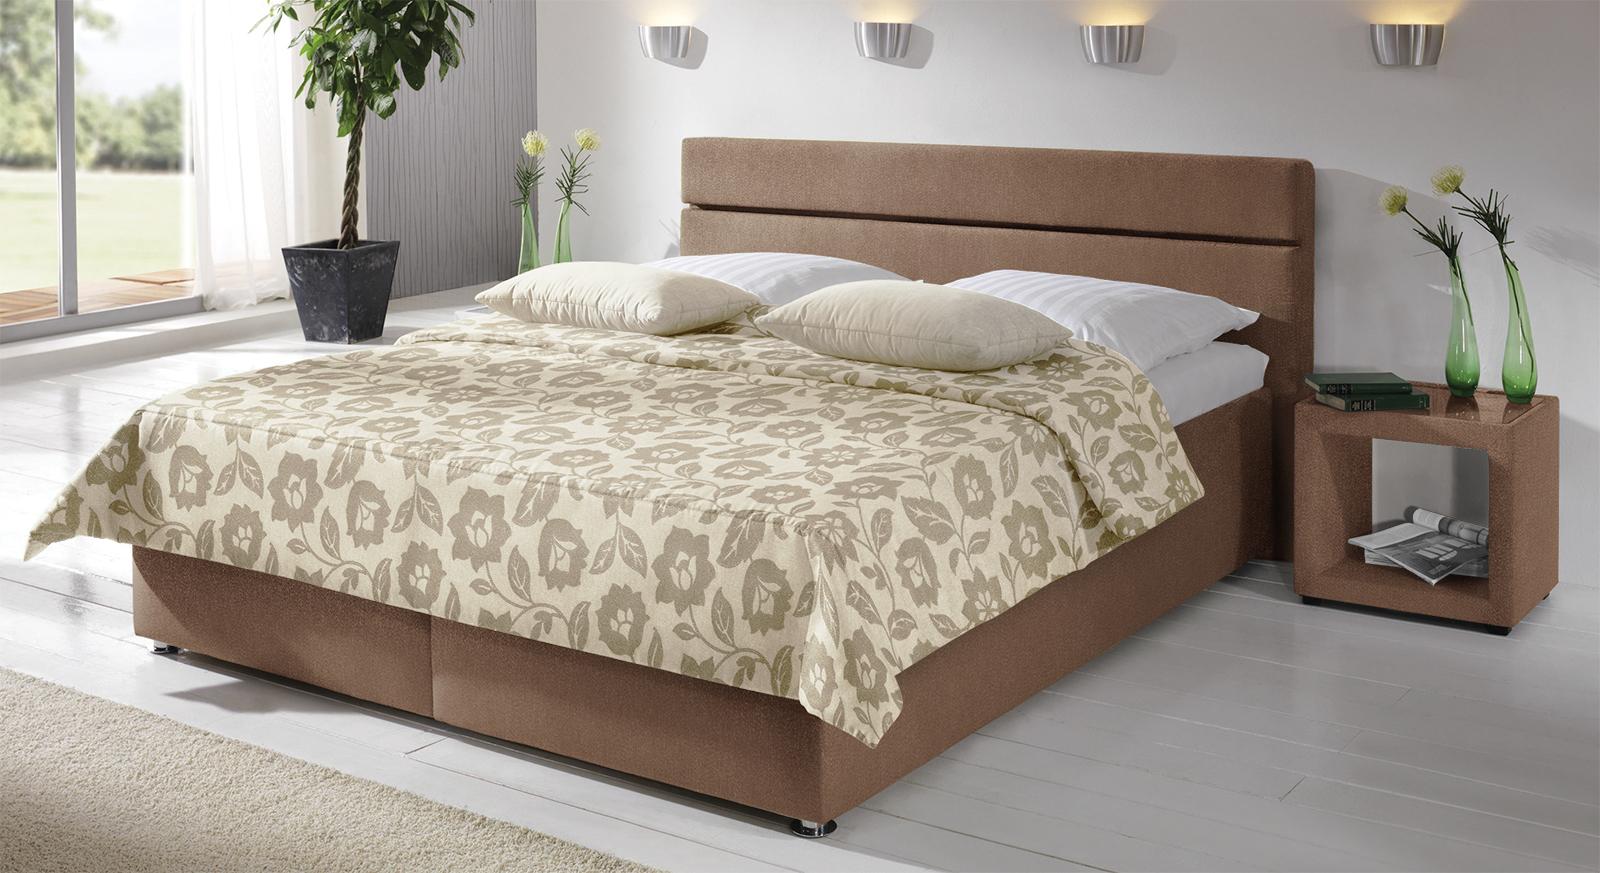 polsterbett severo hochwertig beige und in bergr en. Black Bedroom Furniture Sets. Home Design Ideas